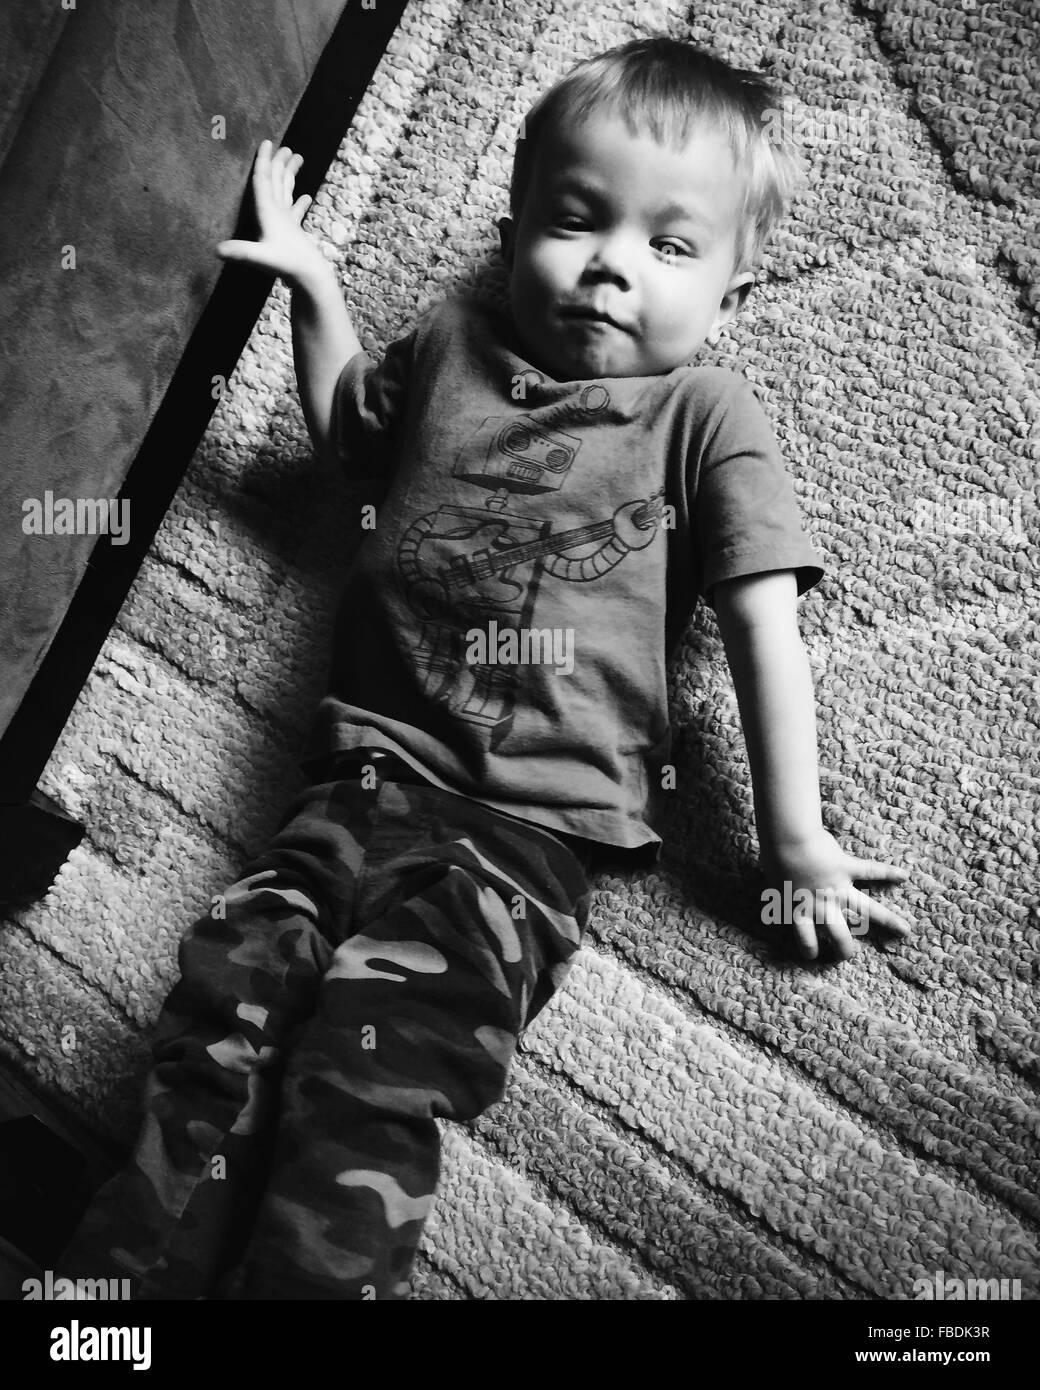 Boy Lying On Carpet - Stock Image